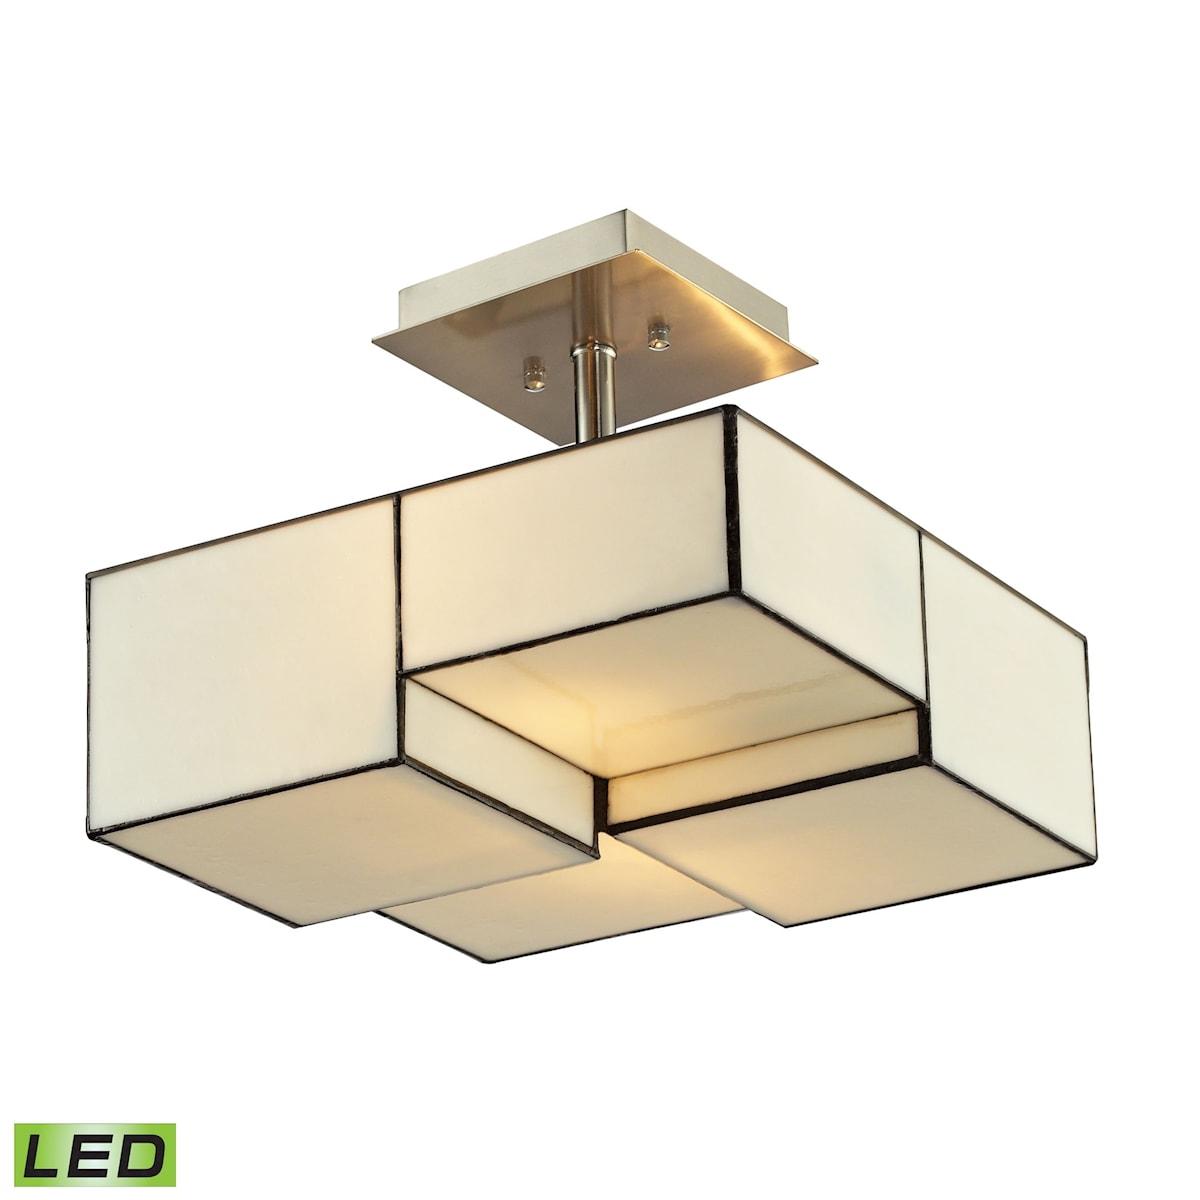 EL-72061-2-LED_Cubist Collection 2 light semi flush in Brushed Nickel - LED